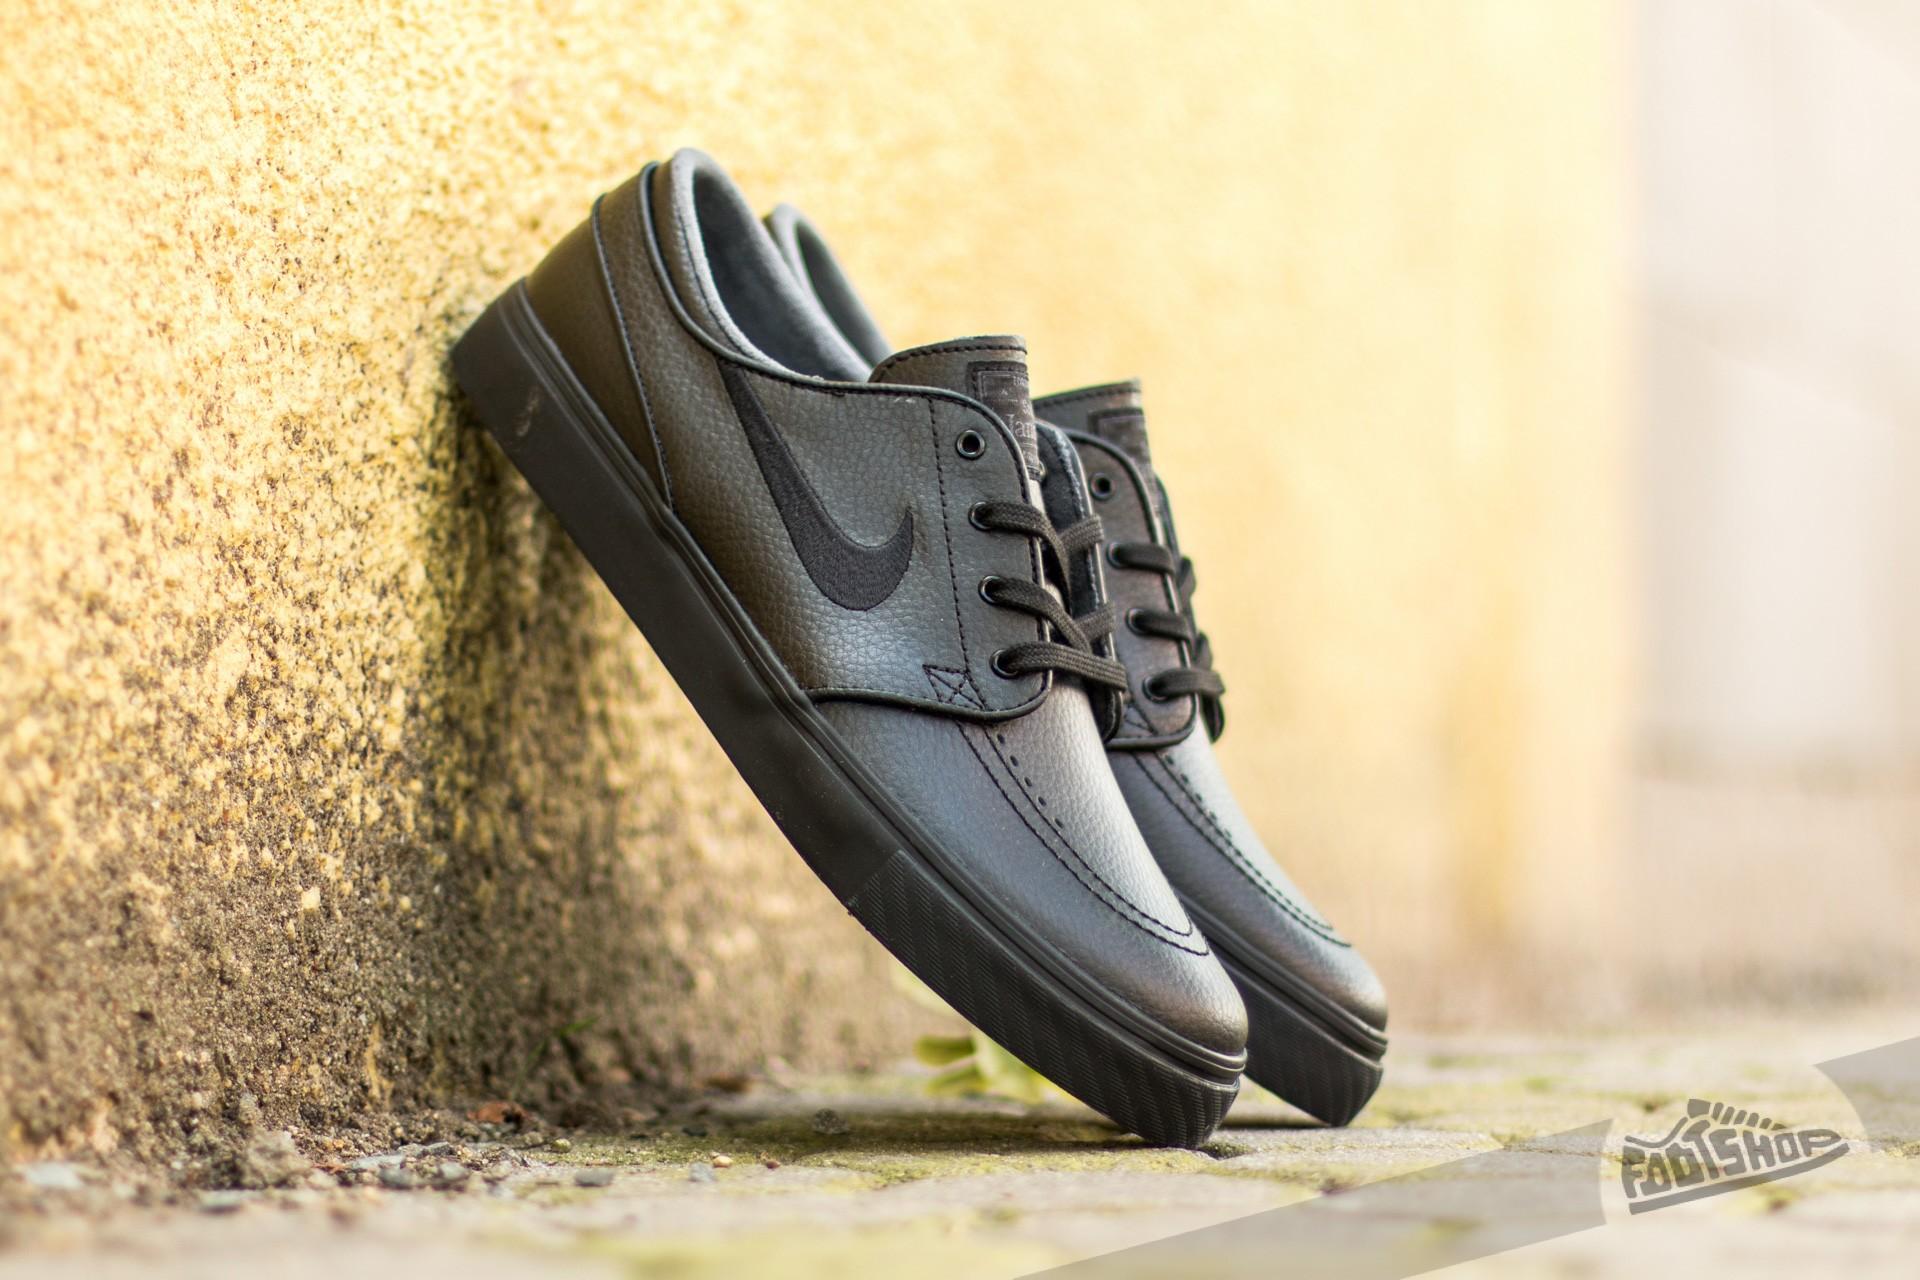 amortiguar tenaz Empleado  Men's shoes Nike Zoom Stefan Janoski L Black/ Black- Black- Anthracite |  Footshop